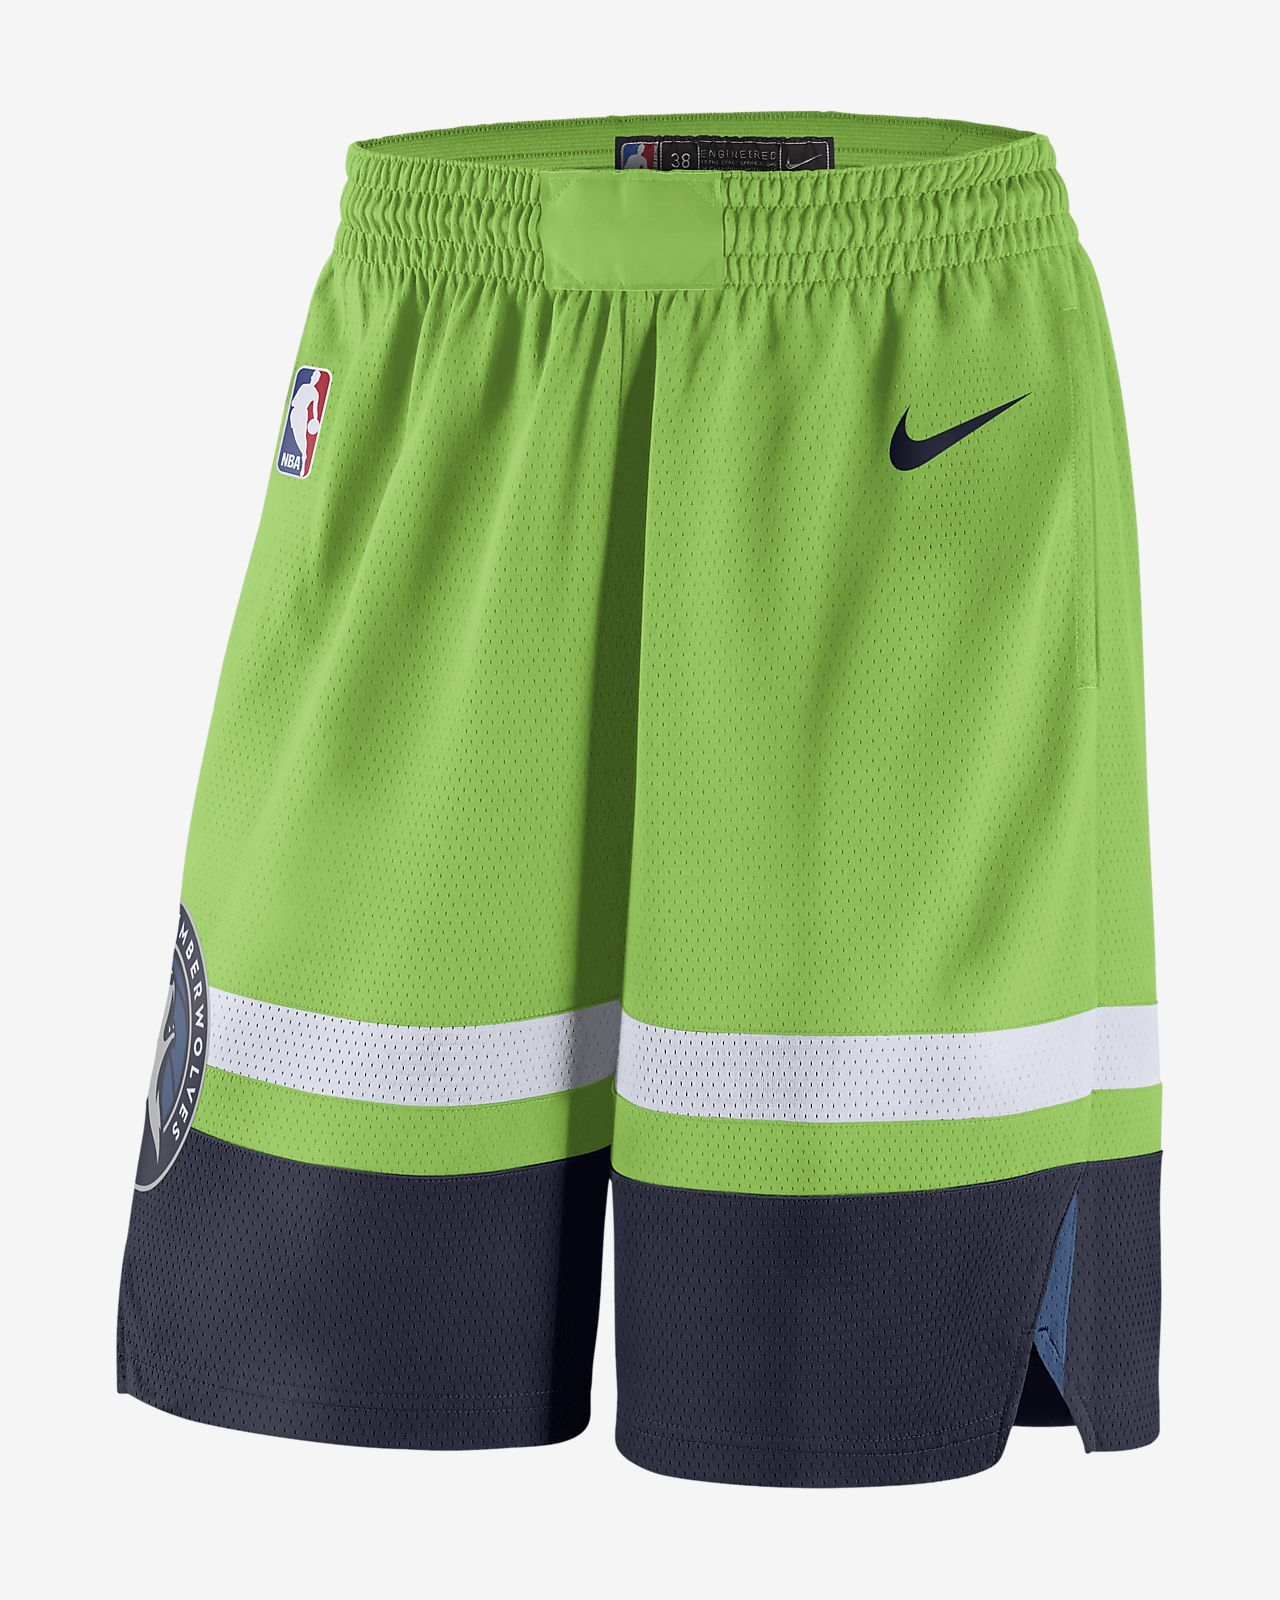 f2e6b1898f2 Men s Nike NBA Shorts. Minnesota Timberwolves Statement Edition Swingman